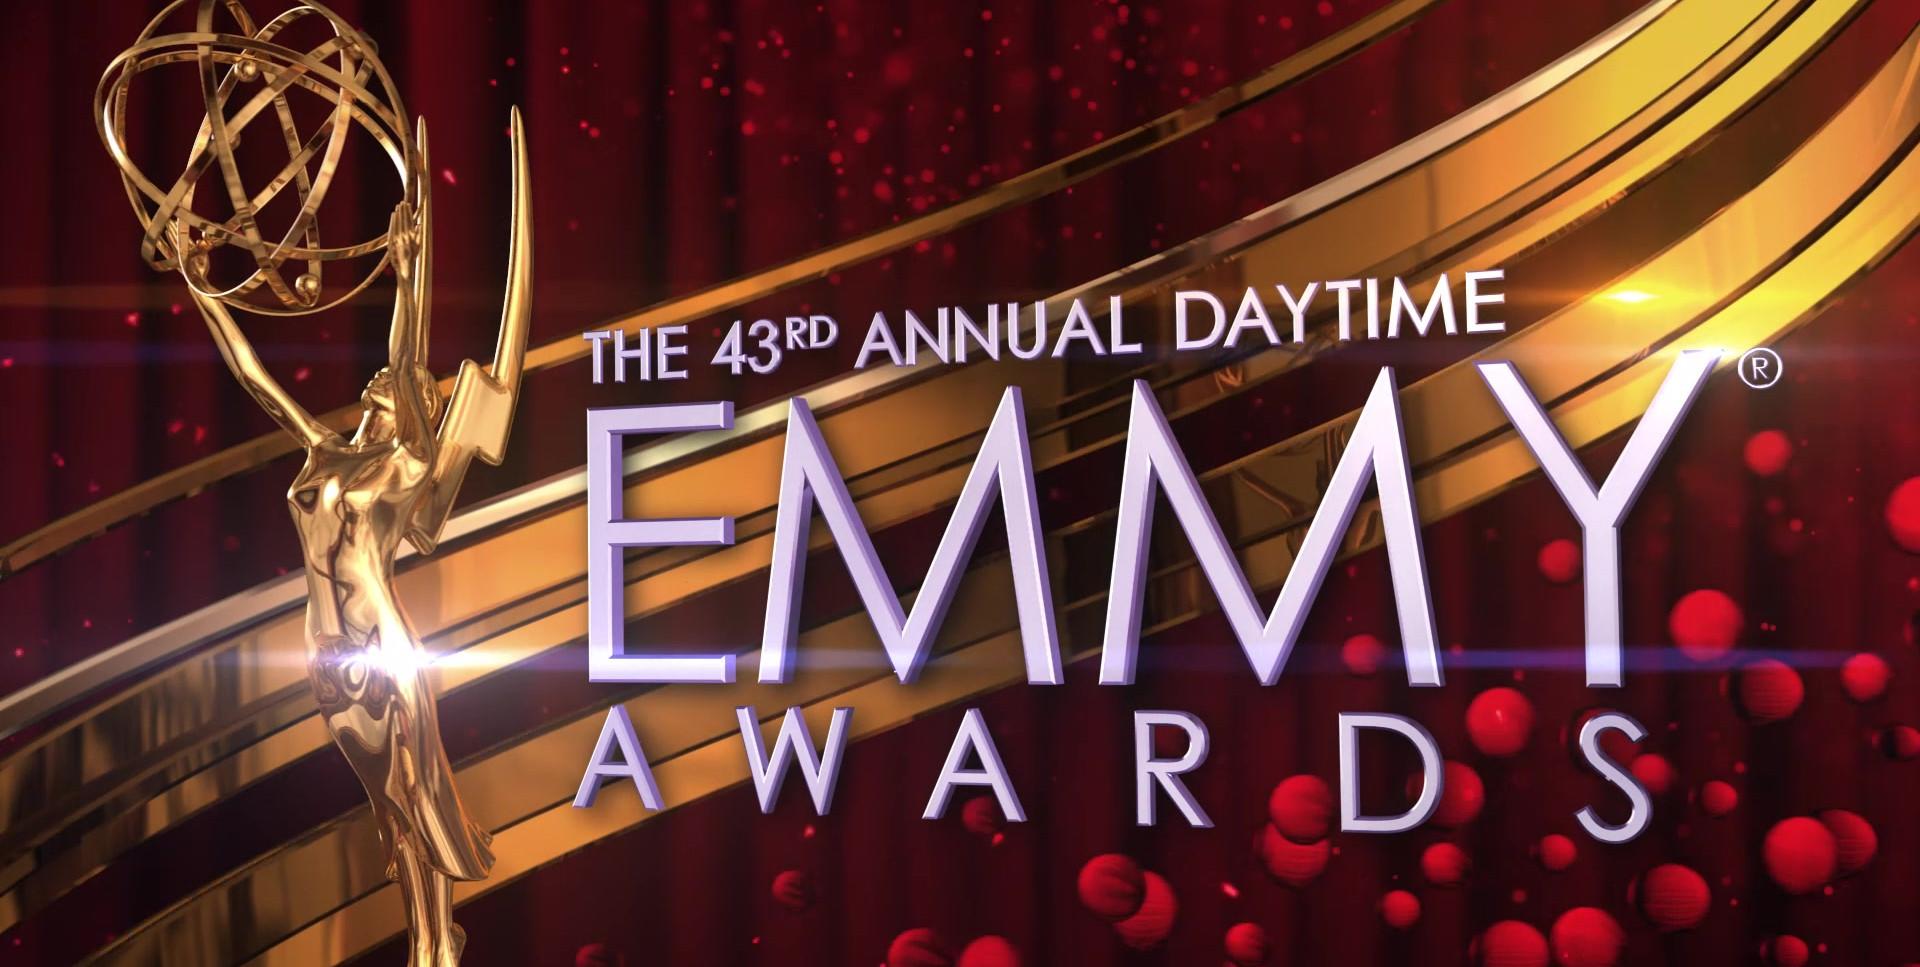 Daytime_Emmy_Awards_Title_2016.mp4